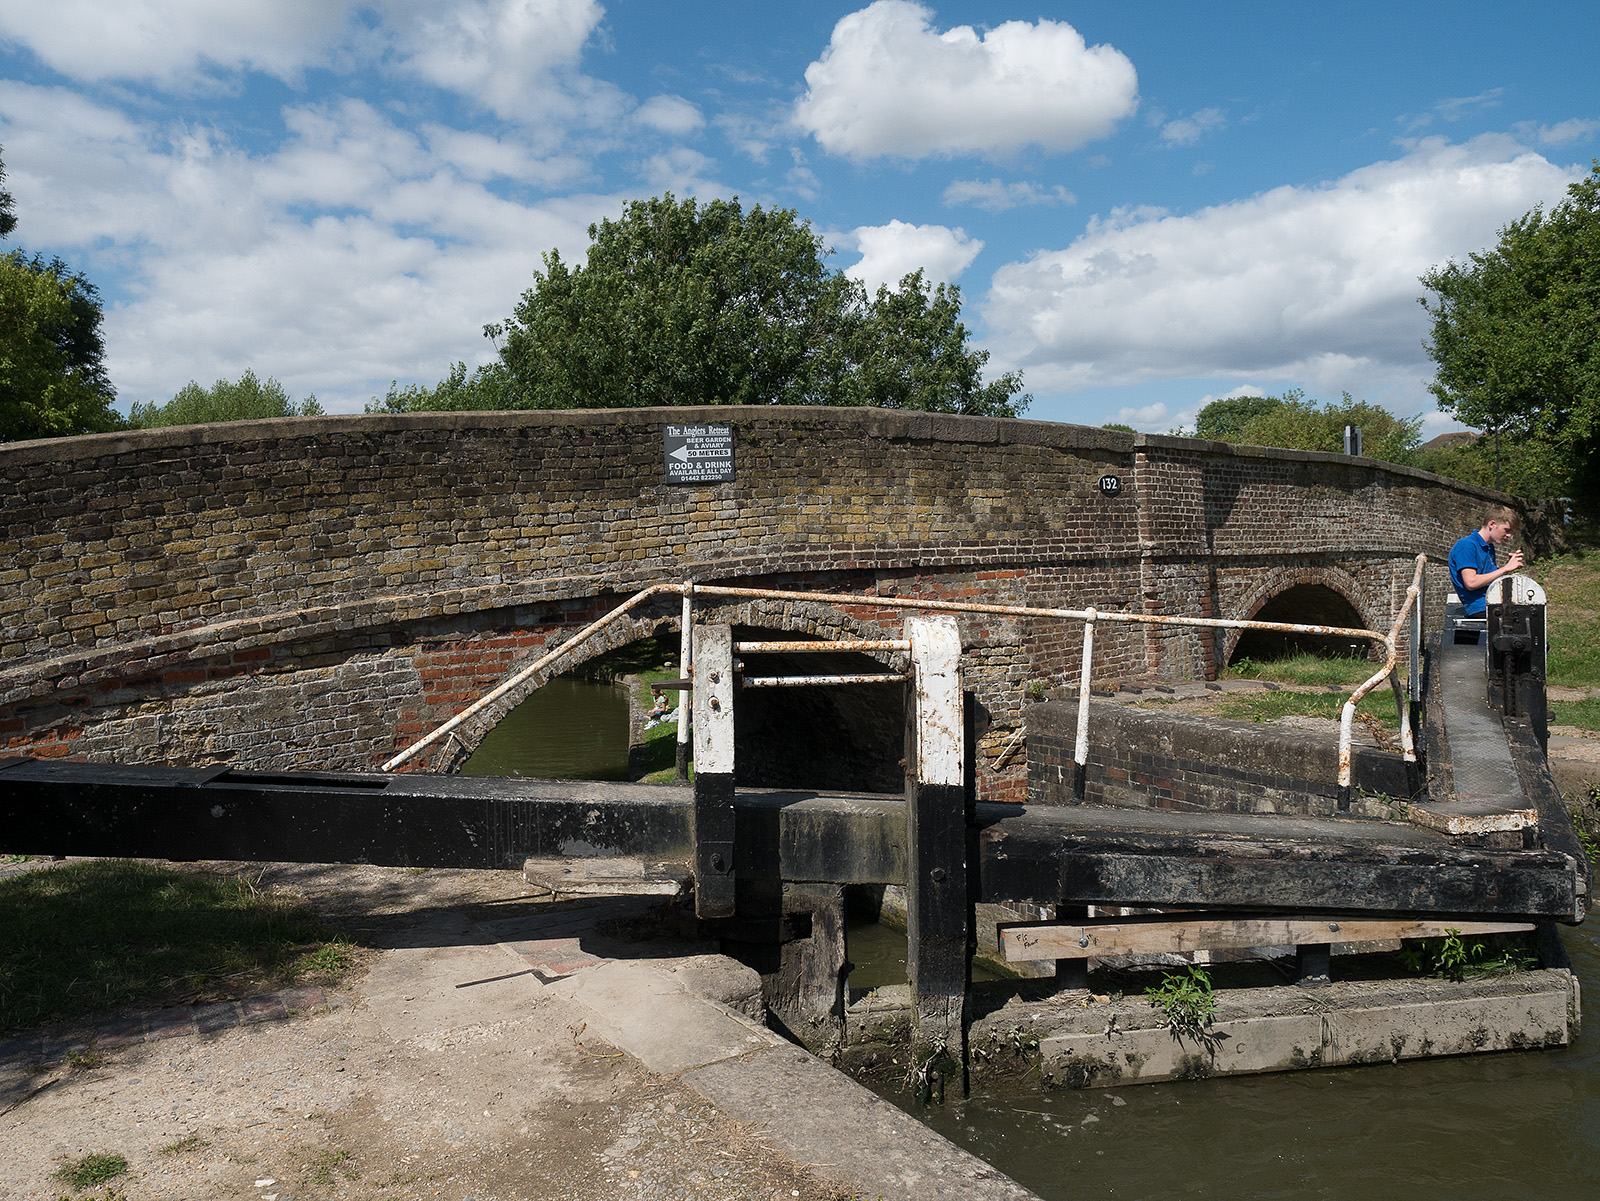 Lower Icknield bridge (note the unused archway)